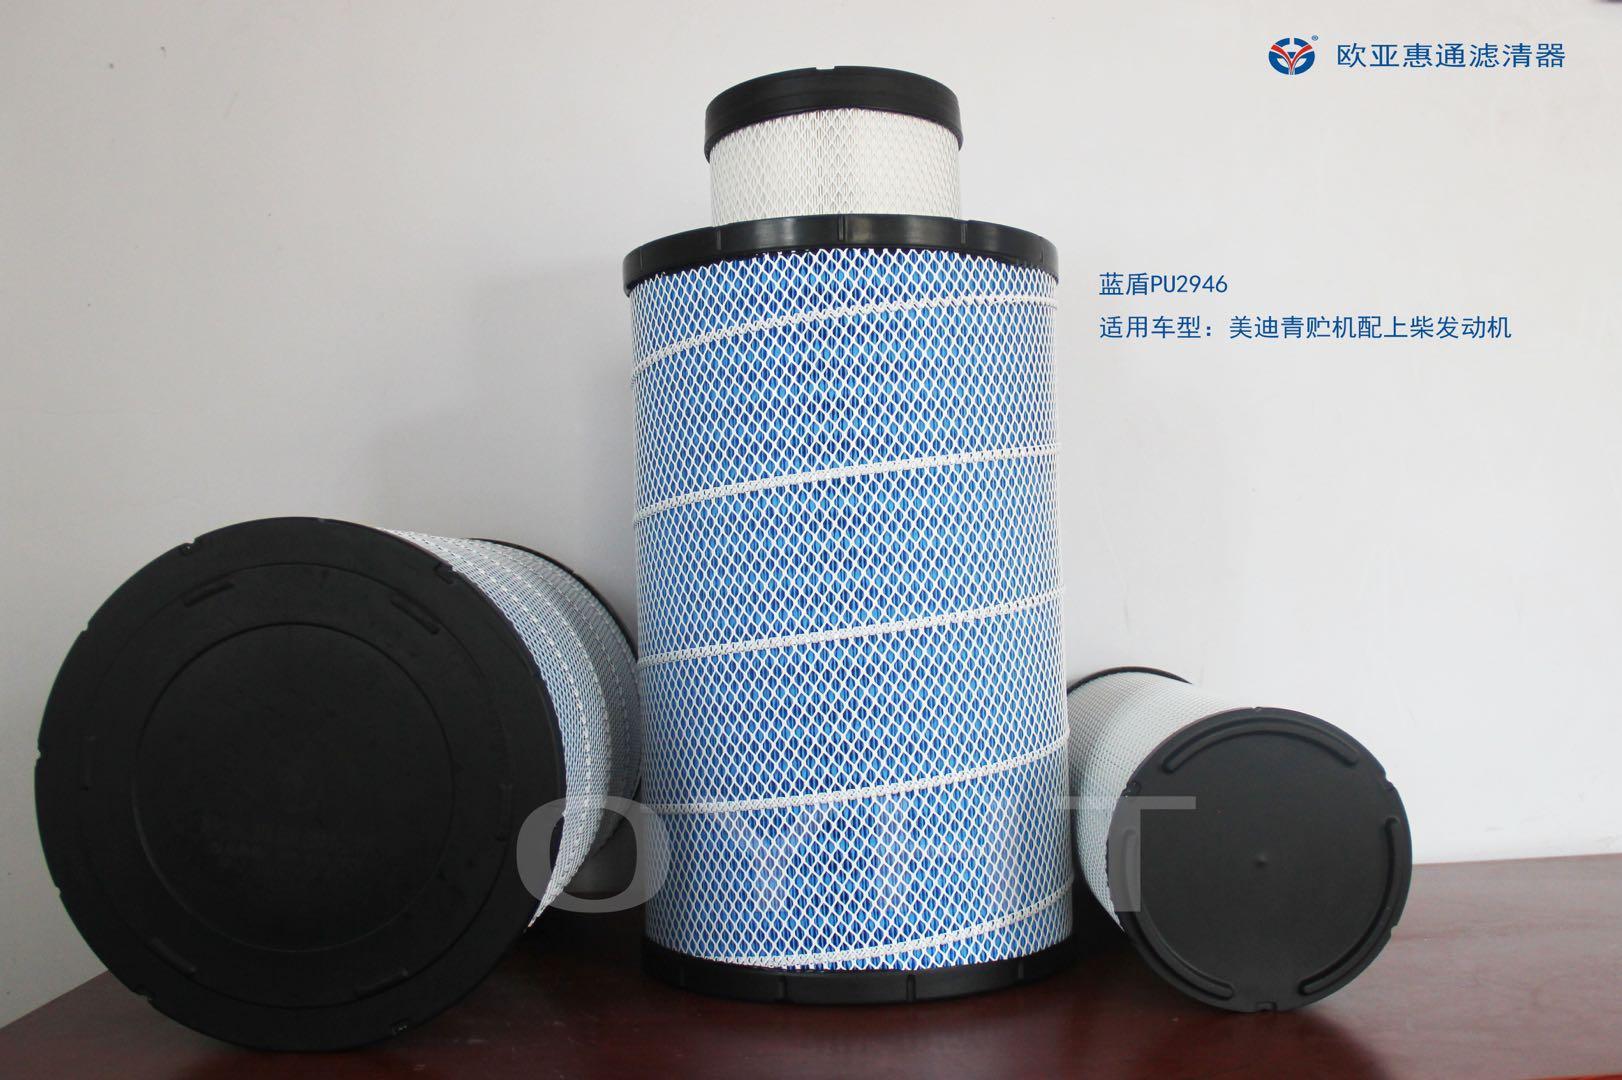 HEPA Air Filter Element